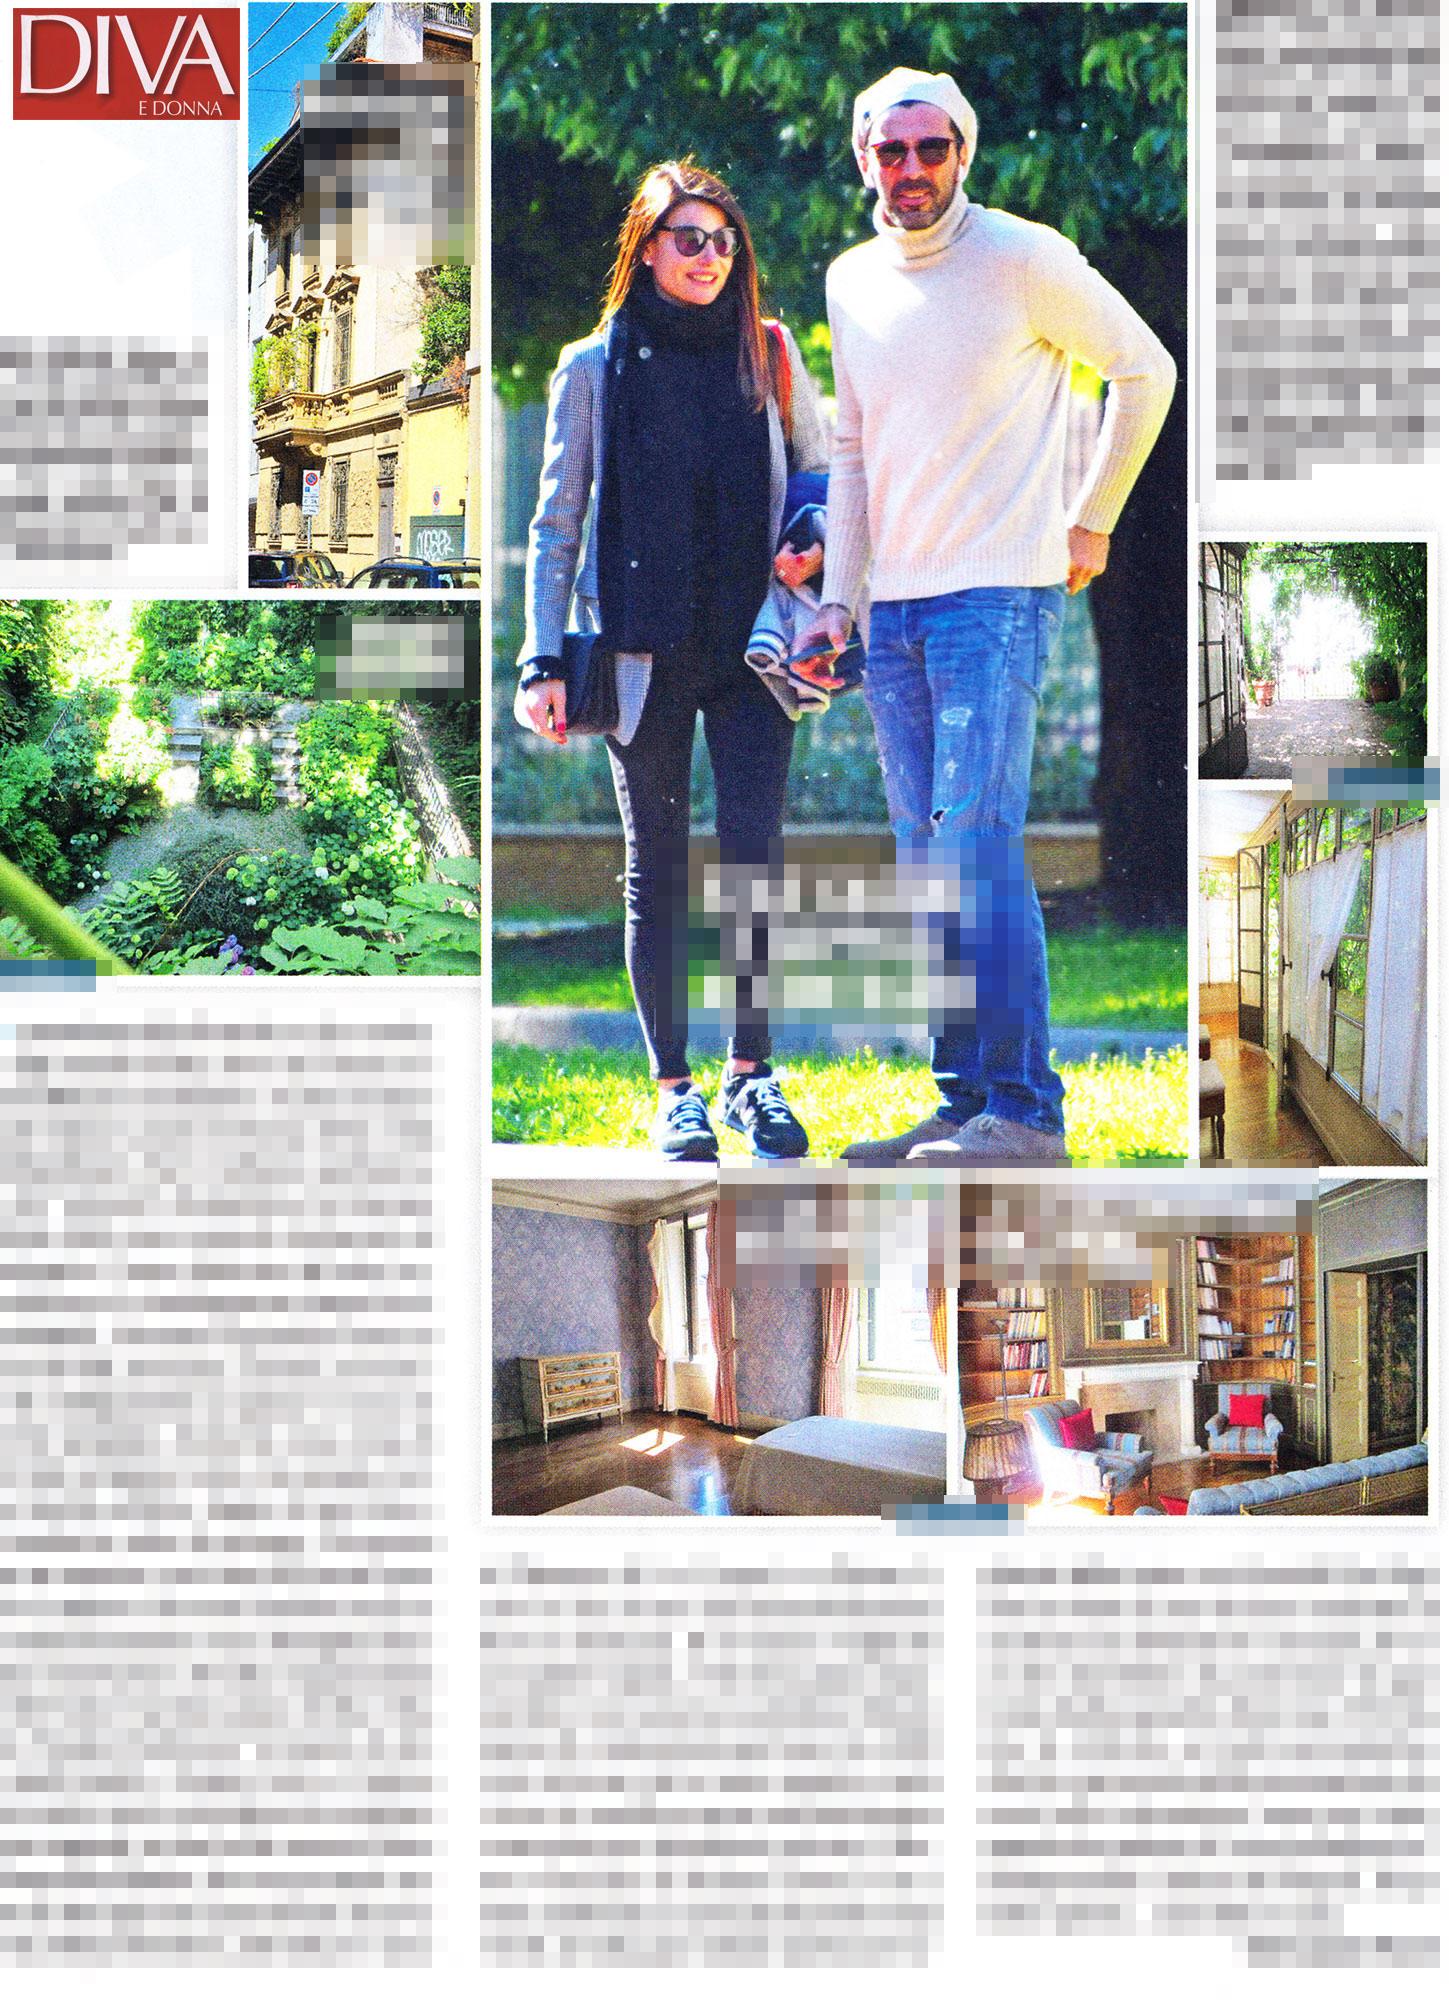 Buffon e D Amico, comprano un nido superlusso a Milano